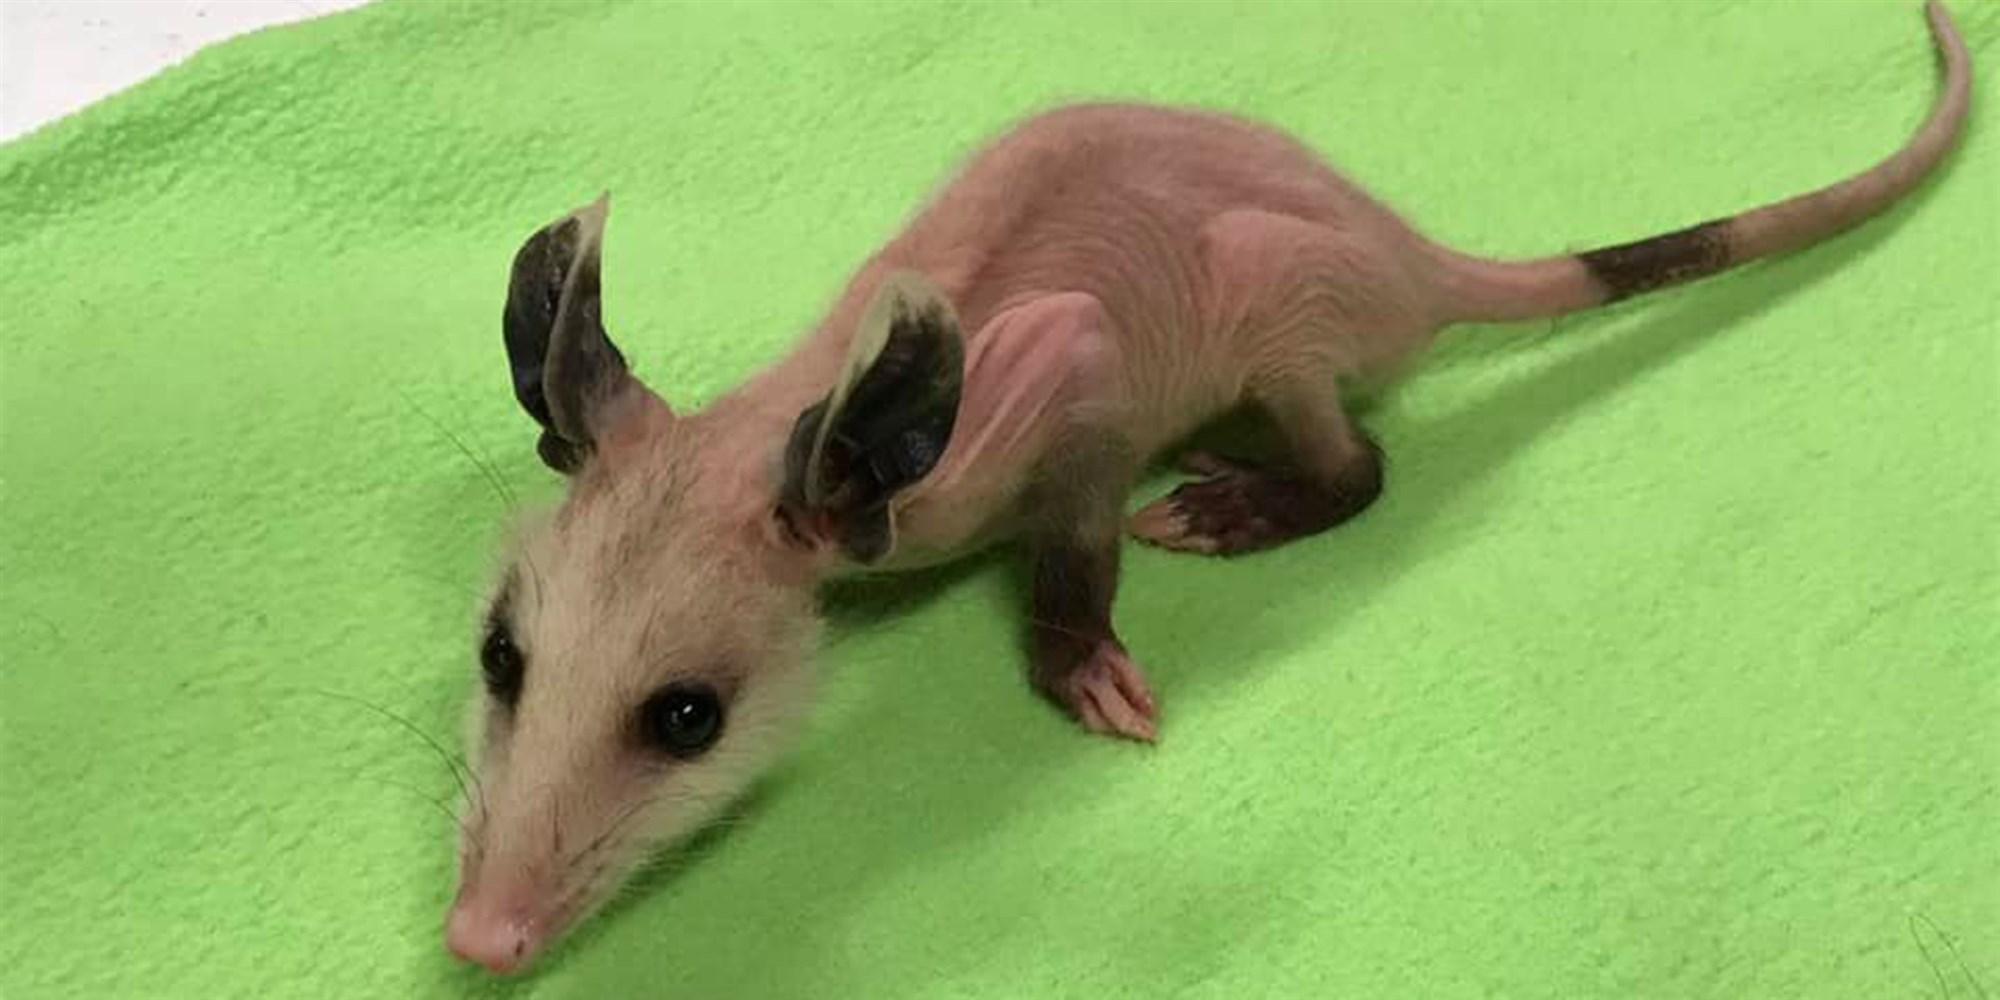 Hairless Baby Opossum Gets A New Wardrobe